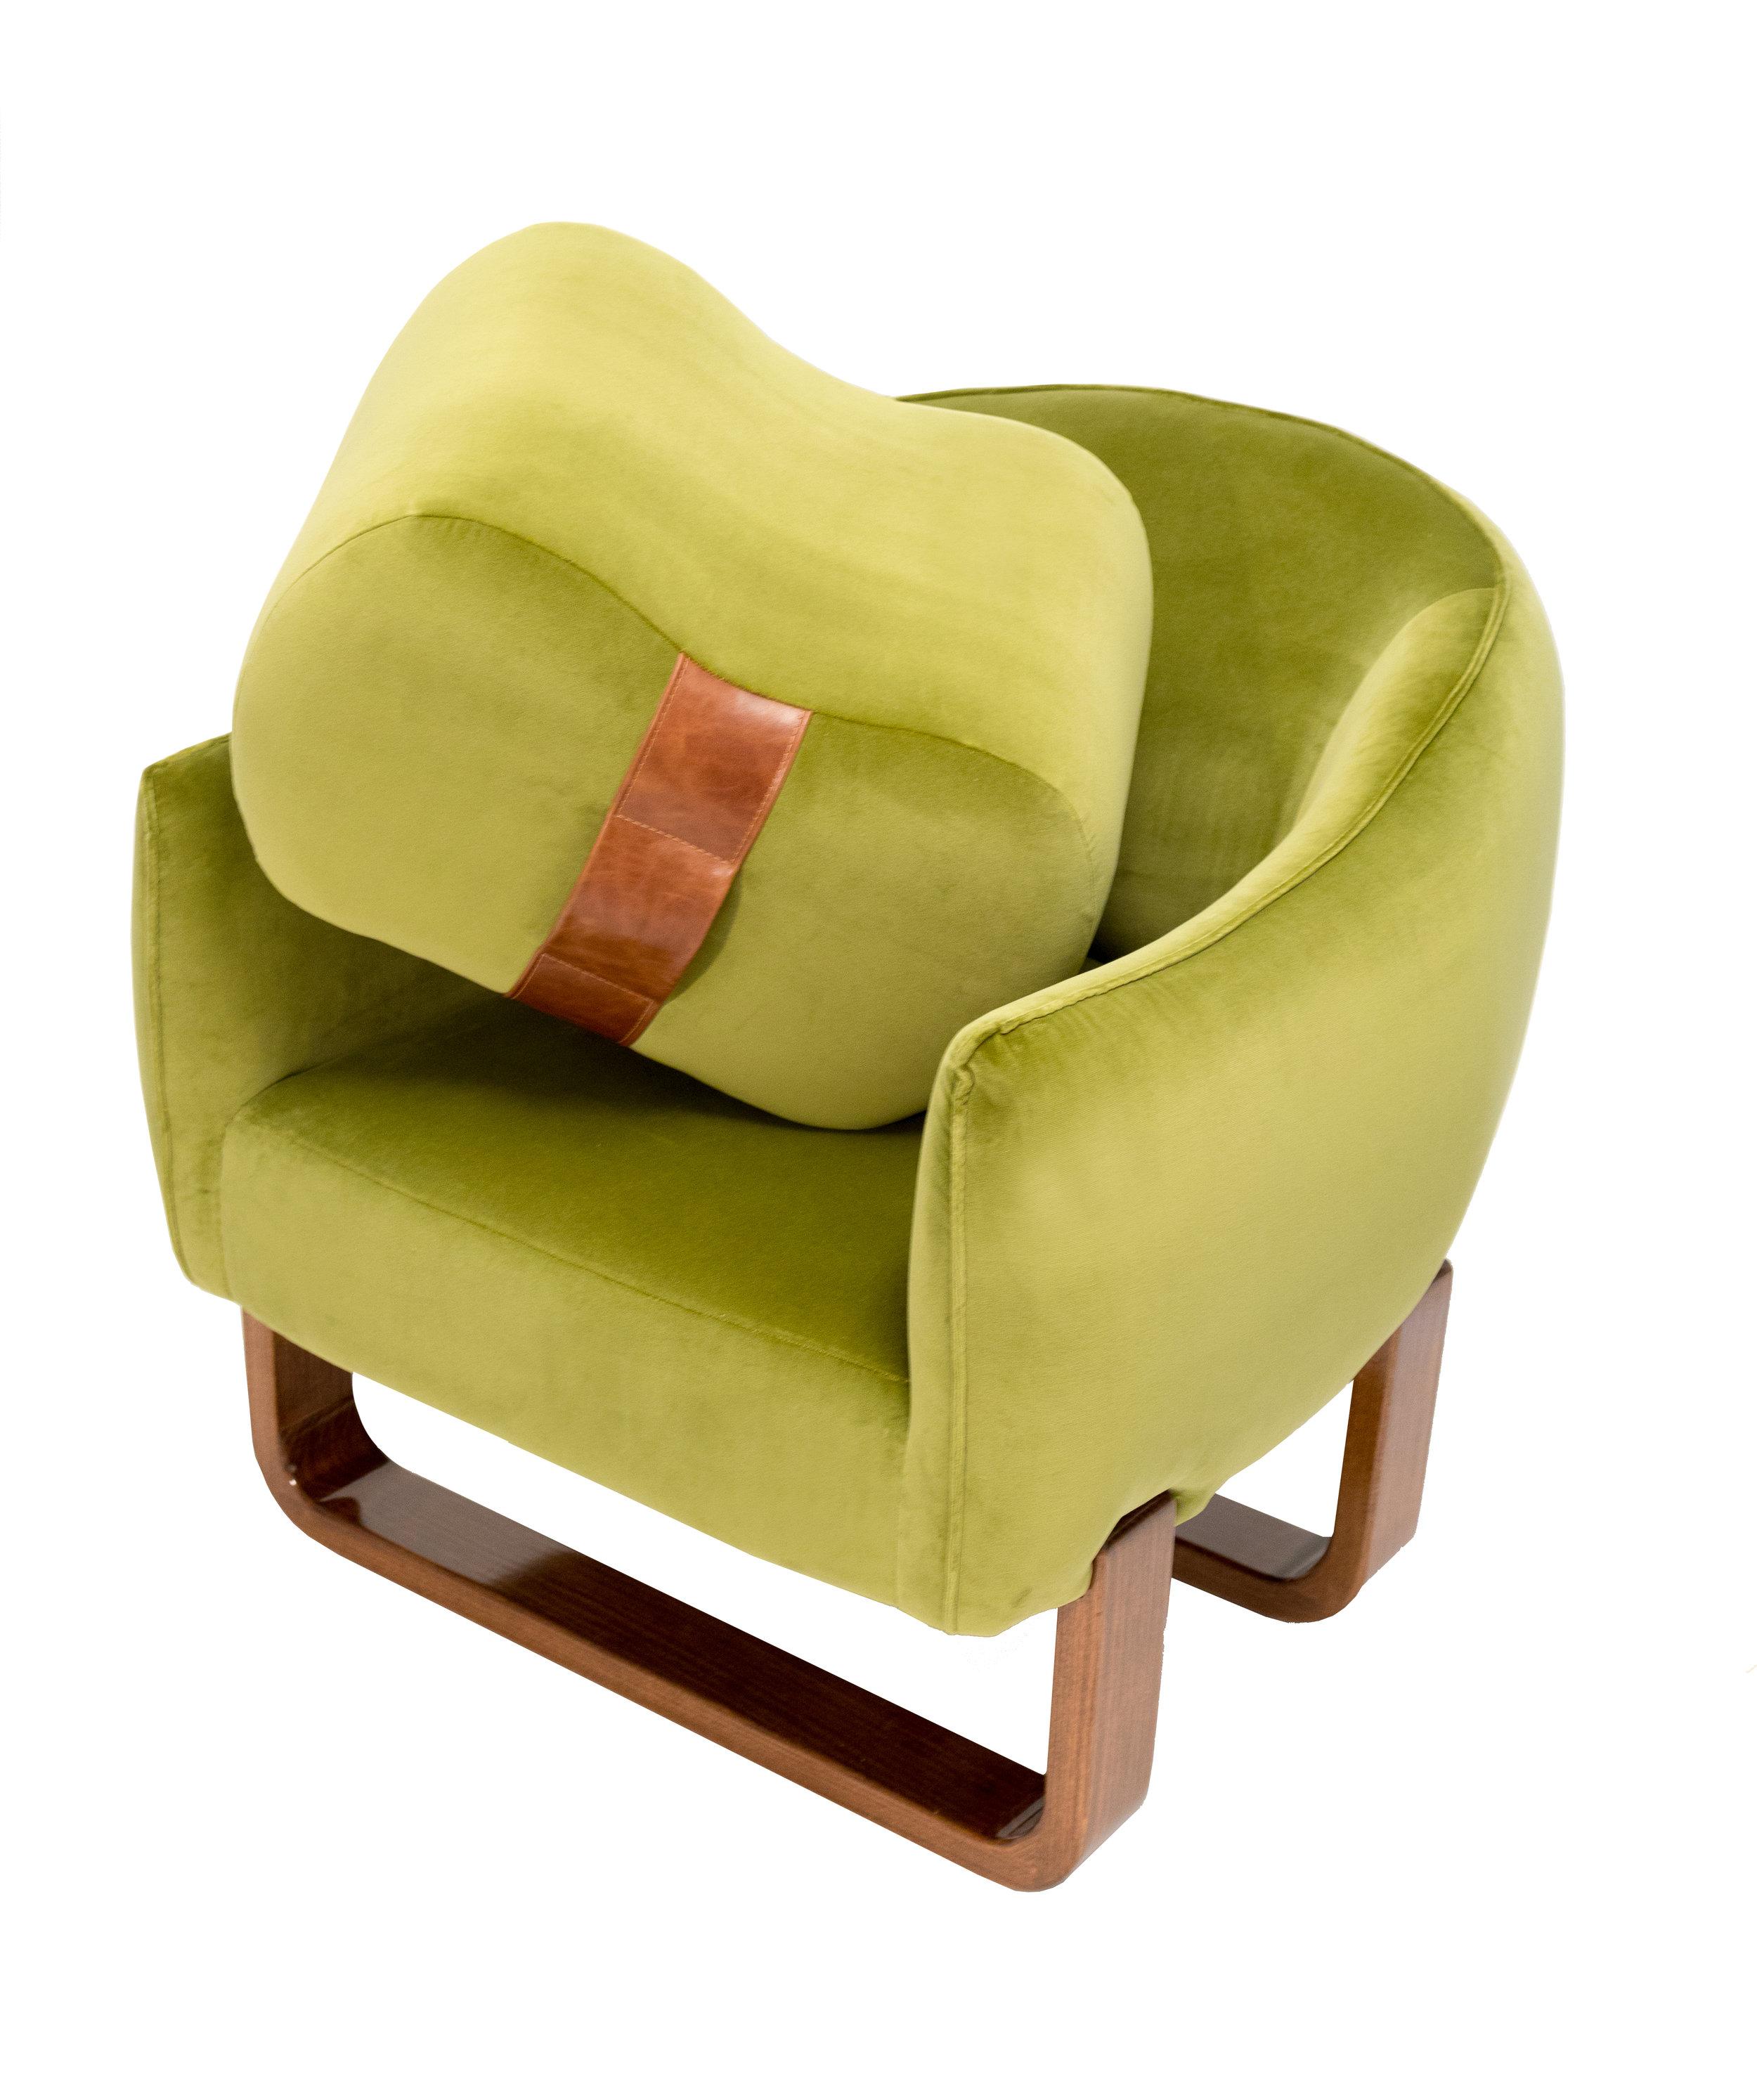 Marie-Burgos-Design. Milo-chair.Milo-ottoman.side.MBcollection.jpg